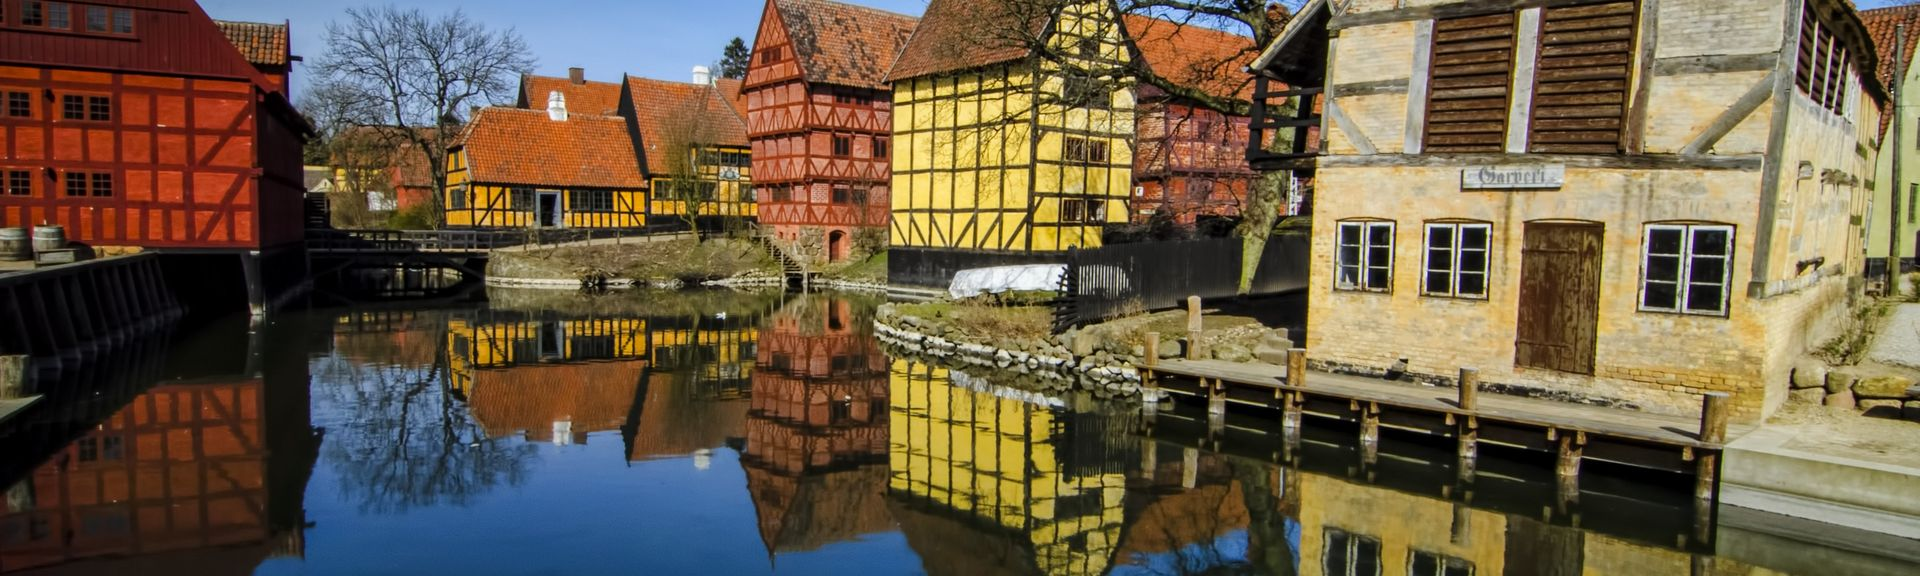 Århus, Mittjylland (region), Danmark